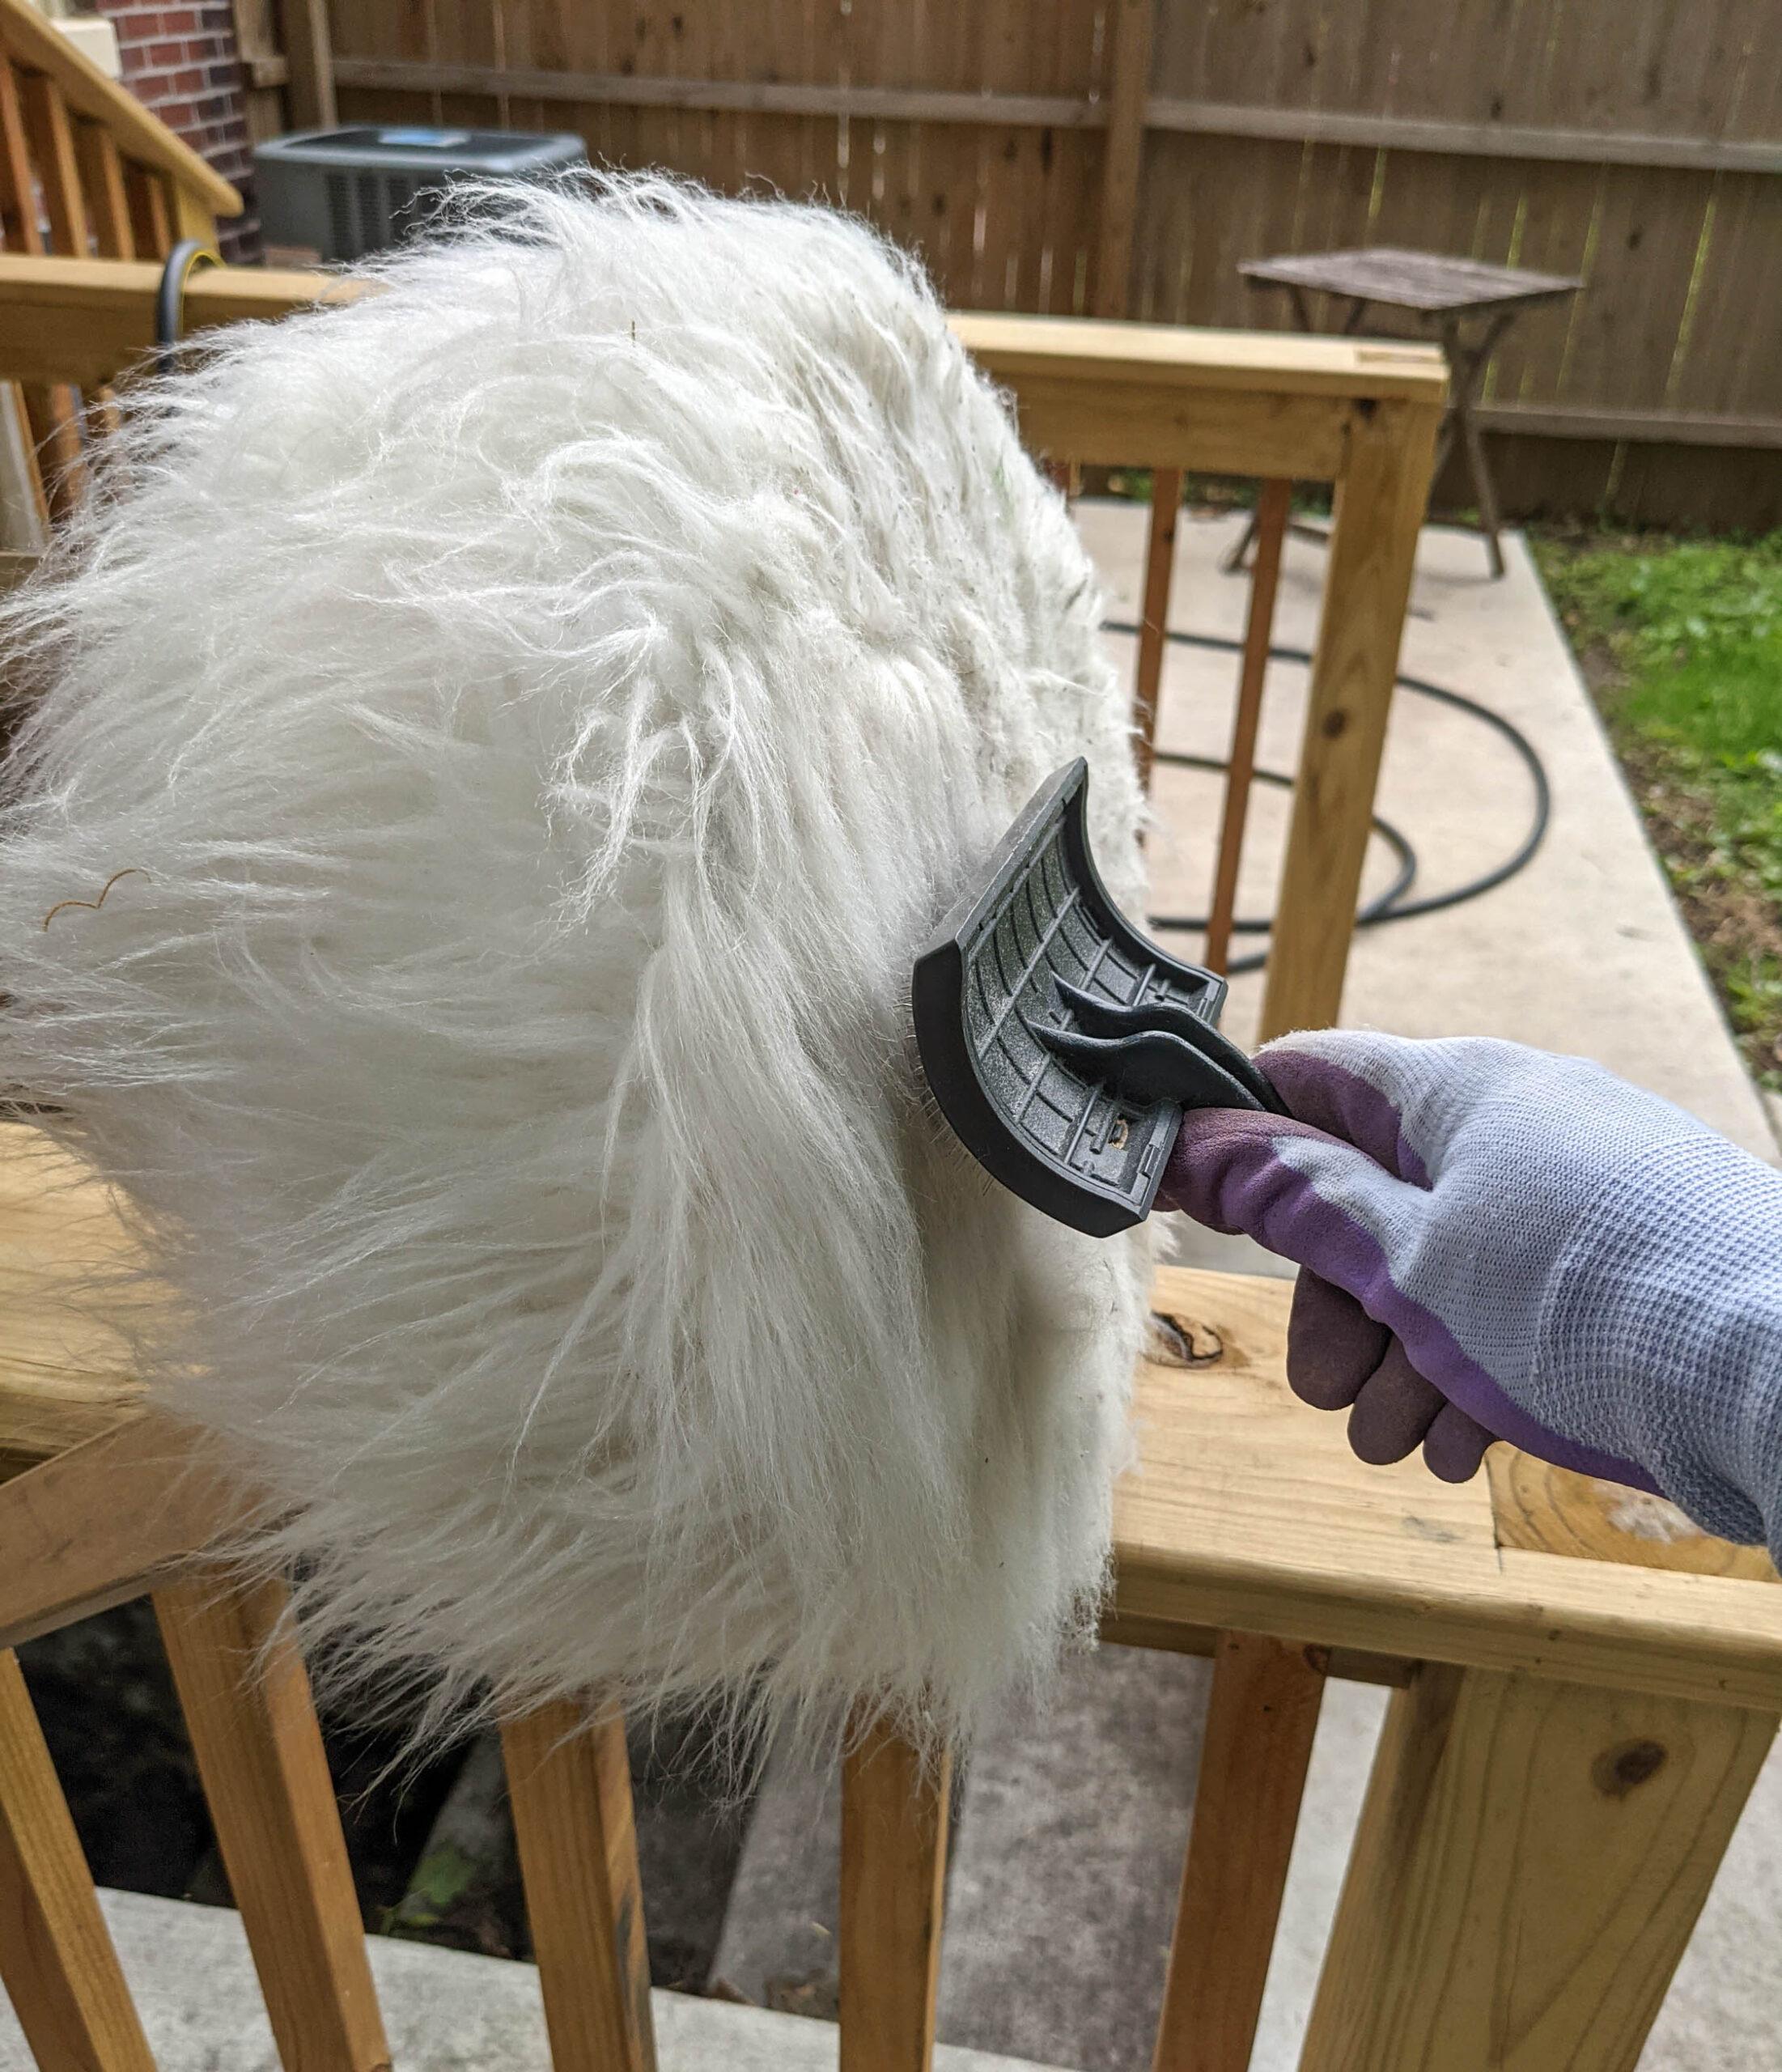 Combing the fibers removes loose fibers, dirt, and debris.